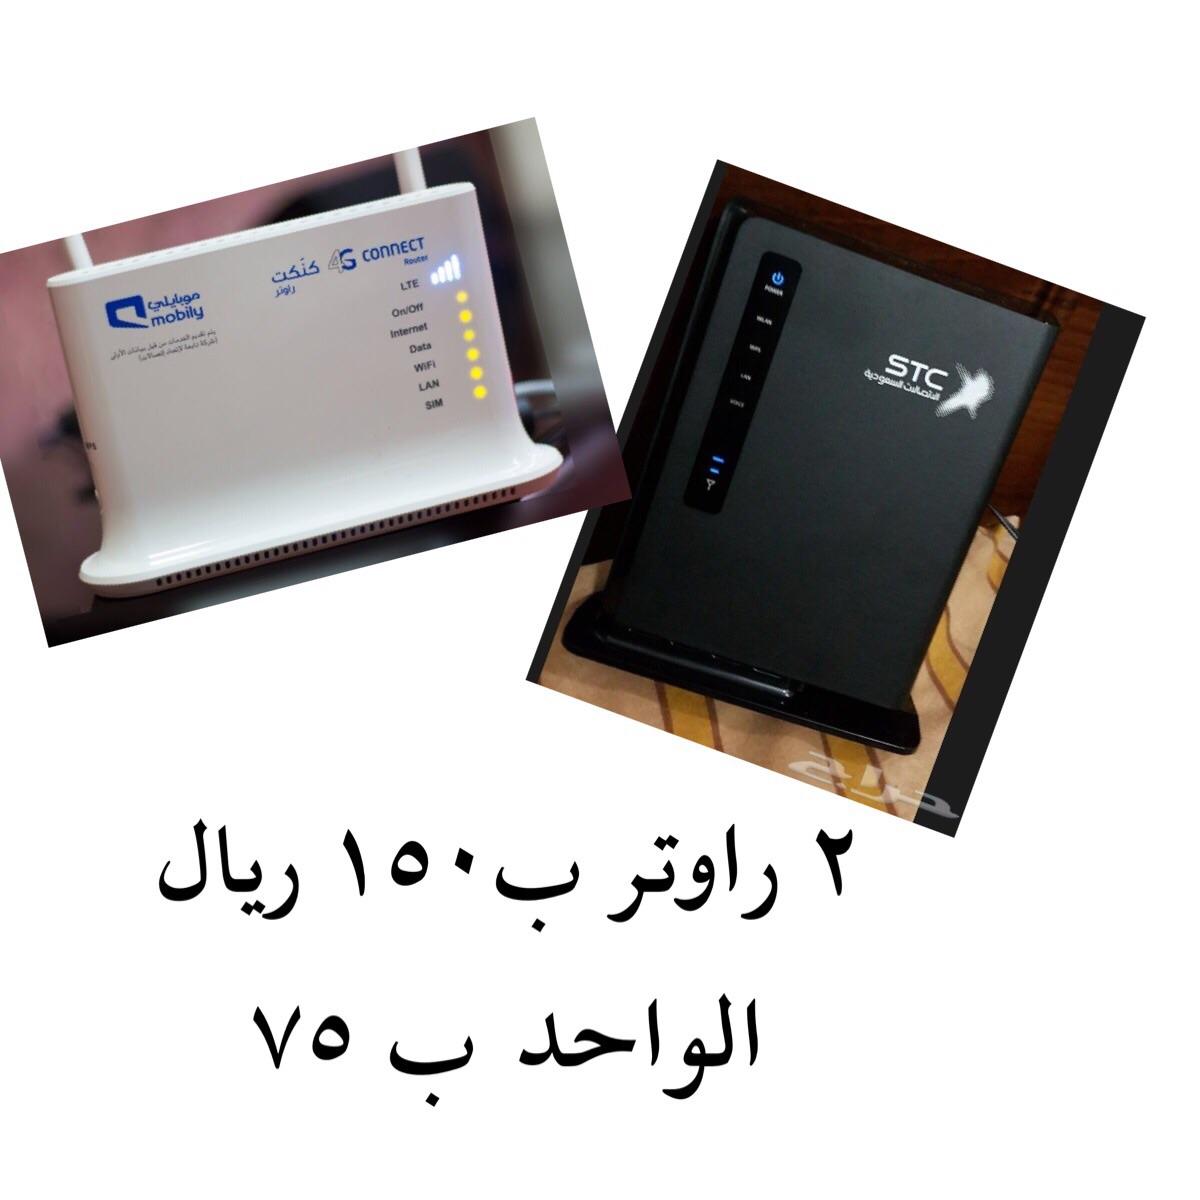 -                          راوتر موبايلى   راوتر STC للتواصل واتس...